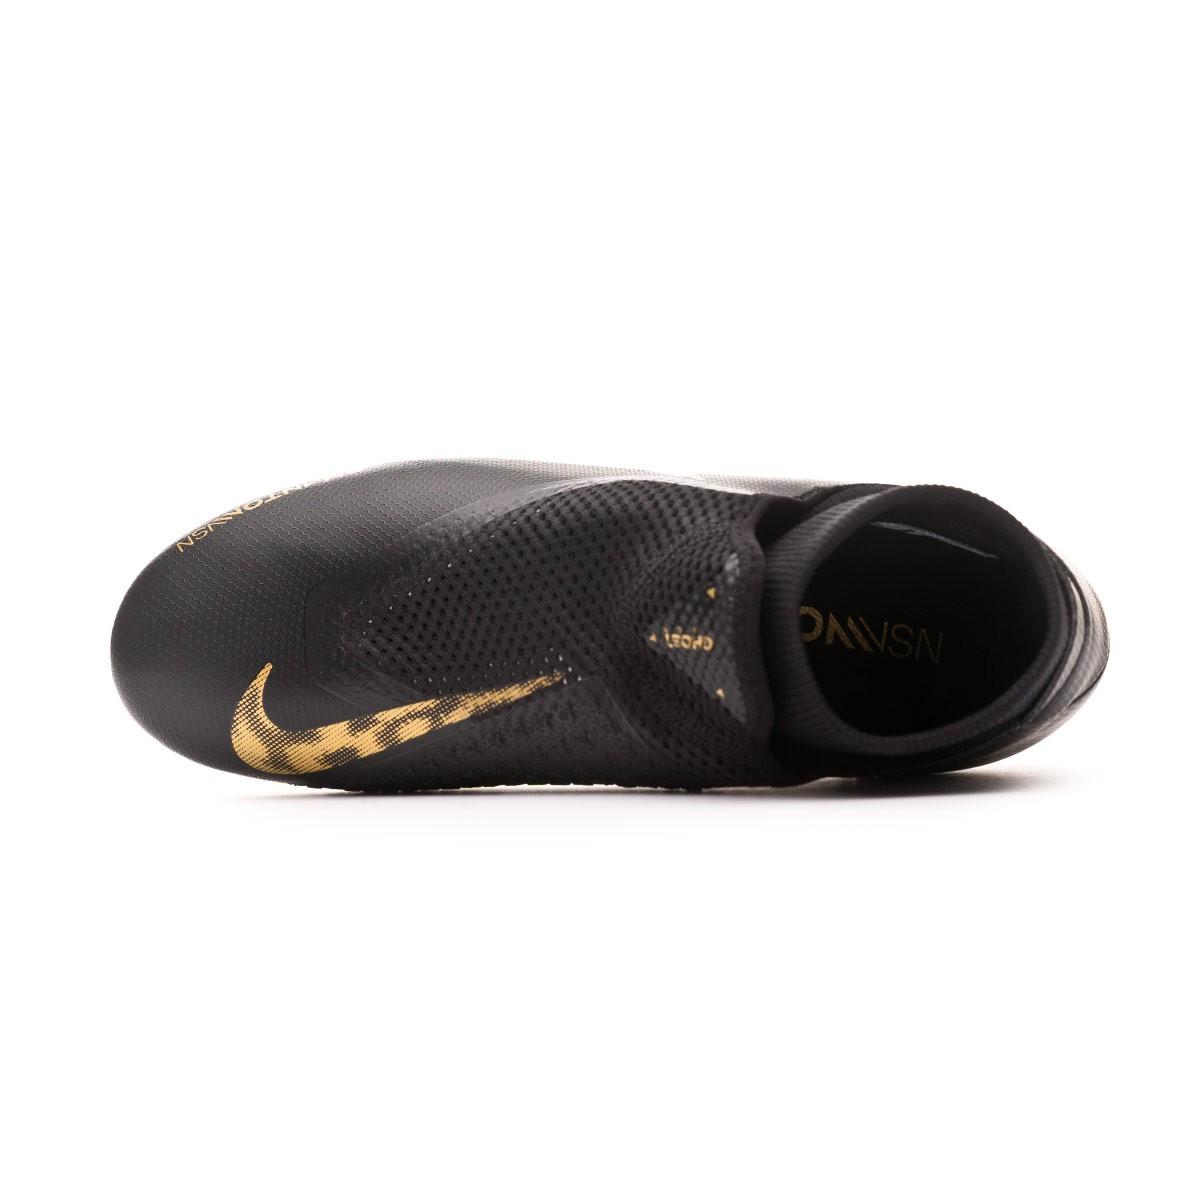 5a21c8f0971ff Football Boots Nike Phantom Vision Academy DF FG MG Black-Metallic vivid  gold - Tienda de fútbol Fútbol Emotion